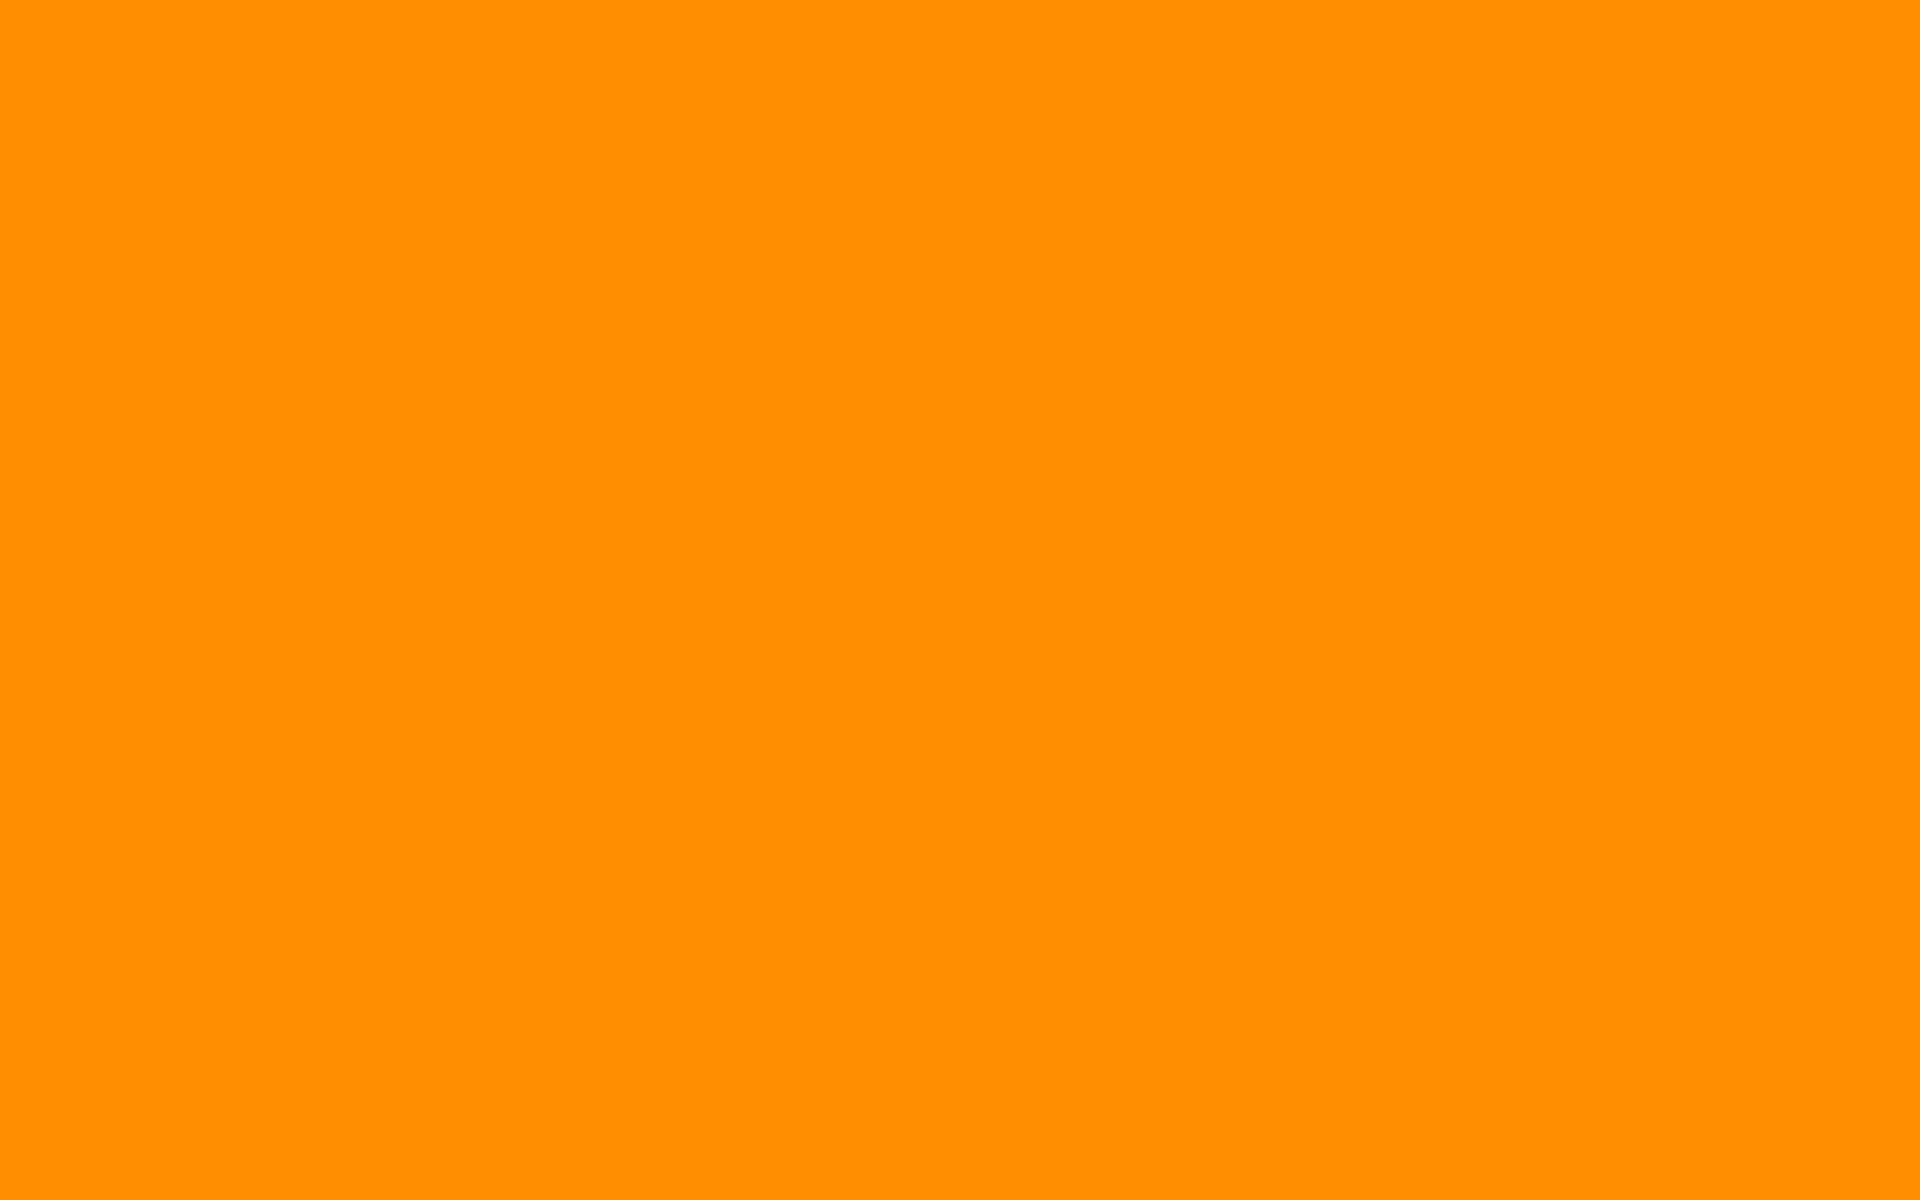 1920x1200 Princeton Orange Solid Color Background